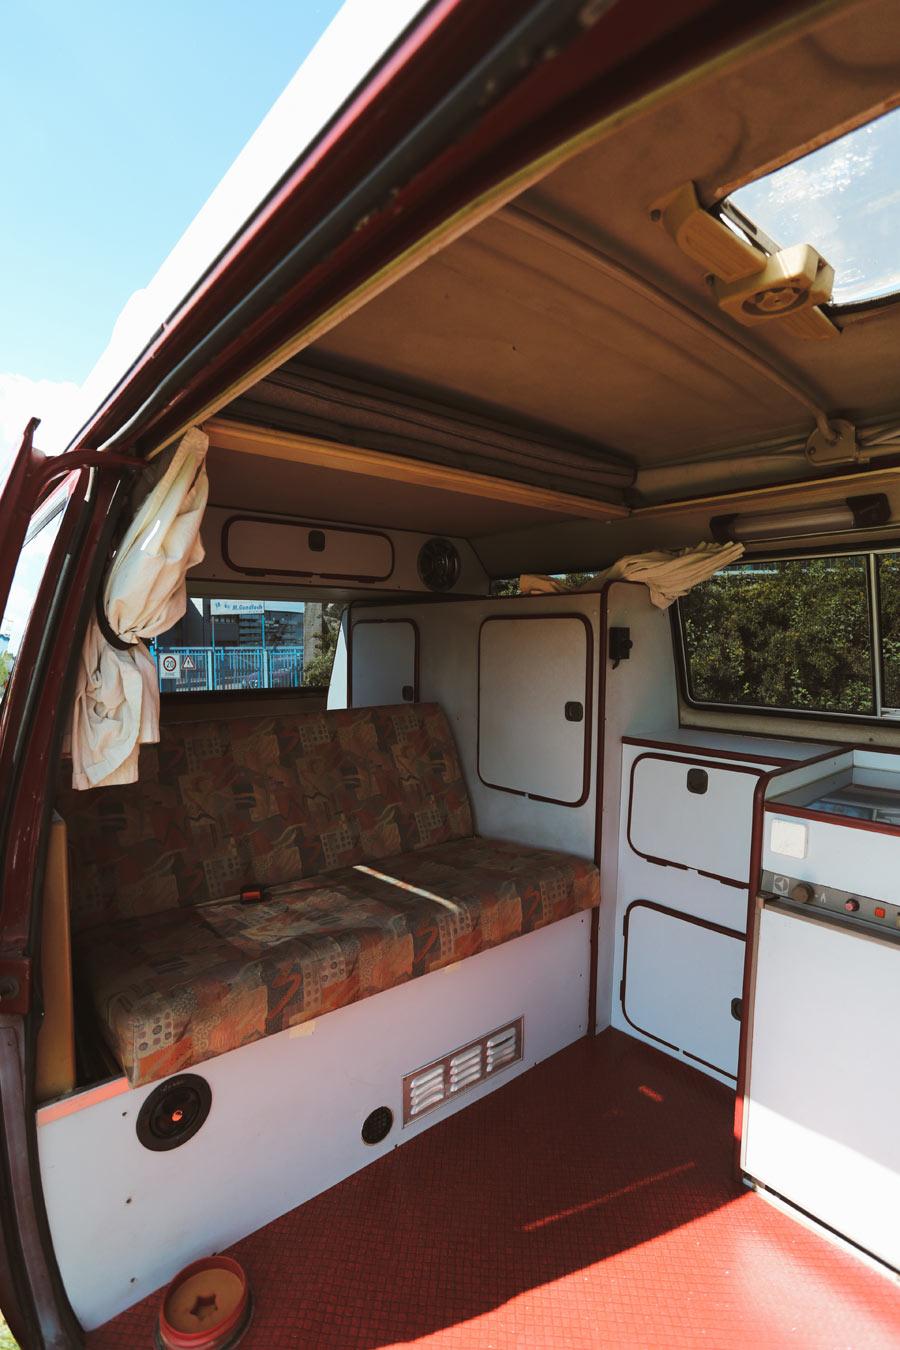 BulliHoliday Campingbus mieten Janine - Wohnraum und hintere Sitzbank